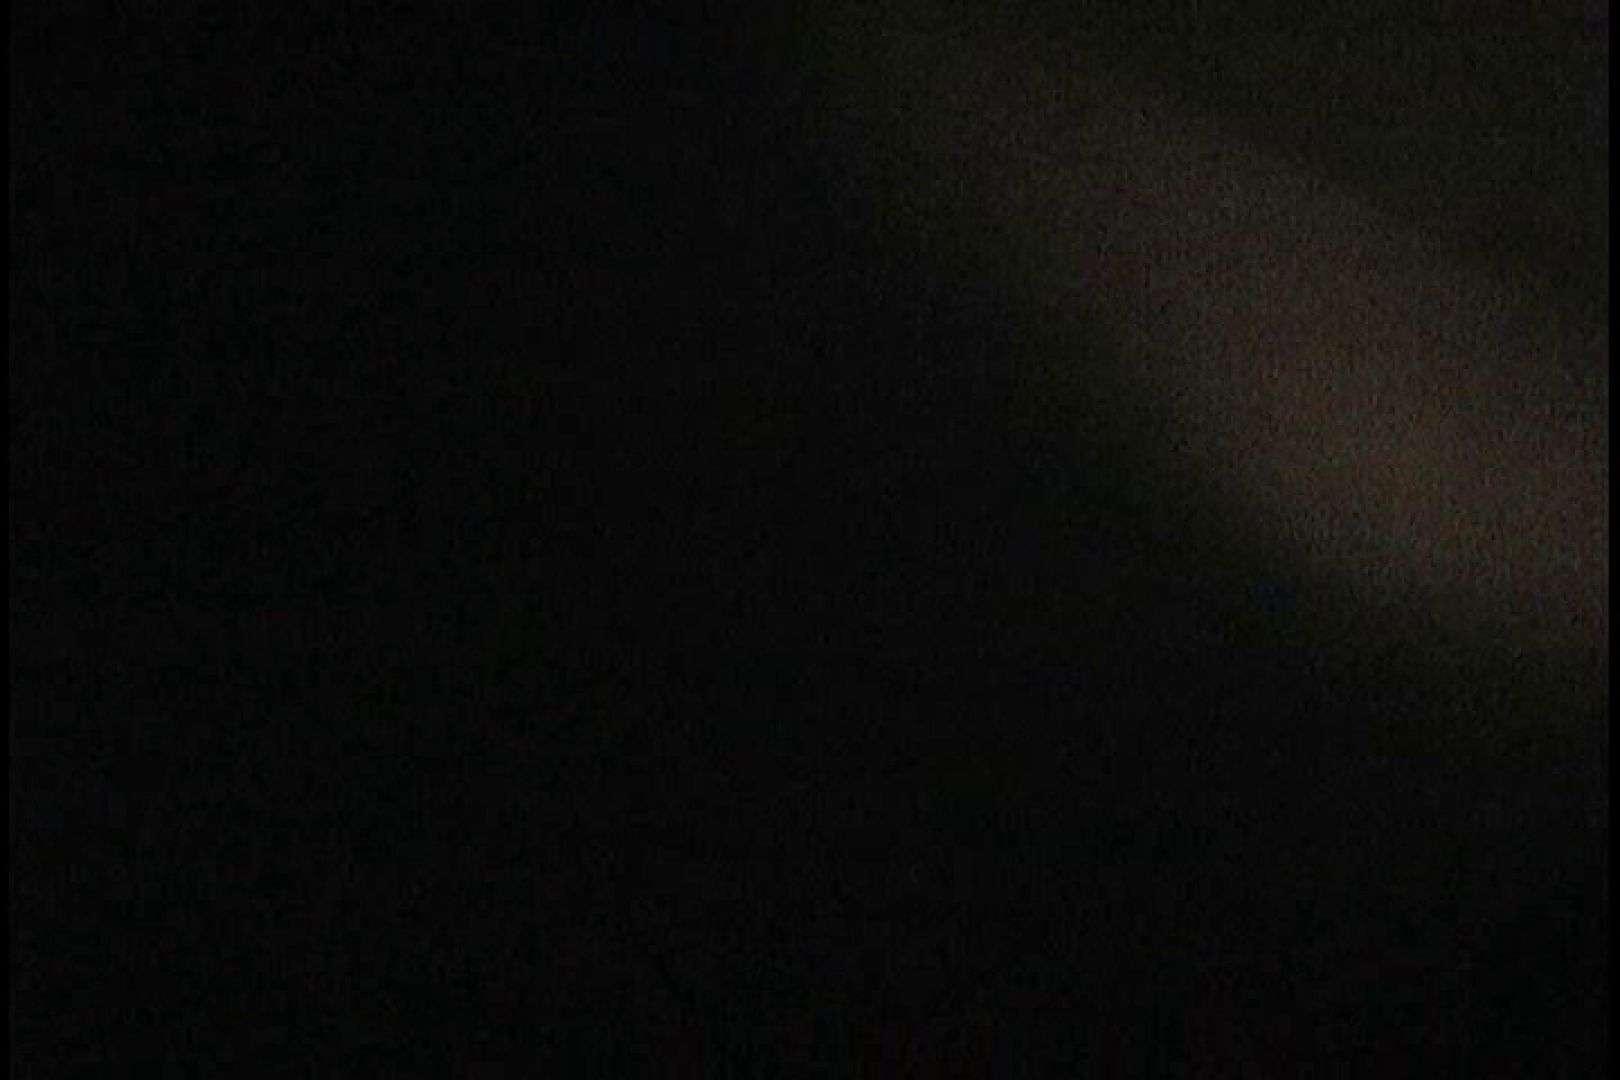 No.68 見事に可愛い巨乳ちゃん 室内暗いです 桃色乳首  70PIX 1